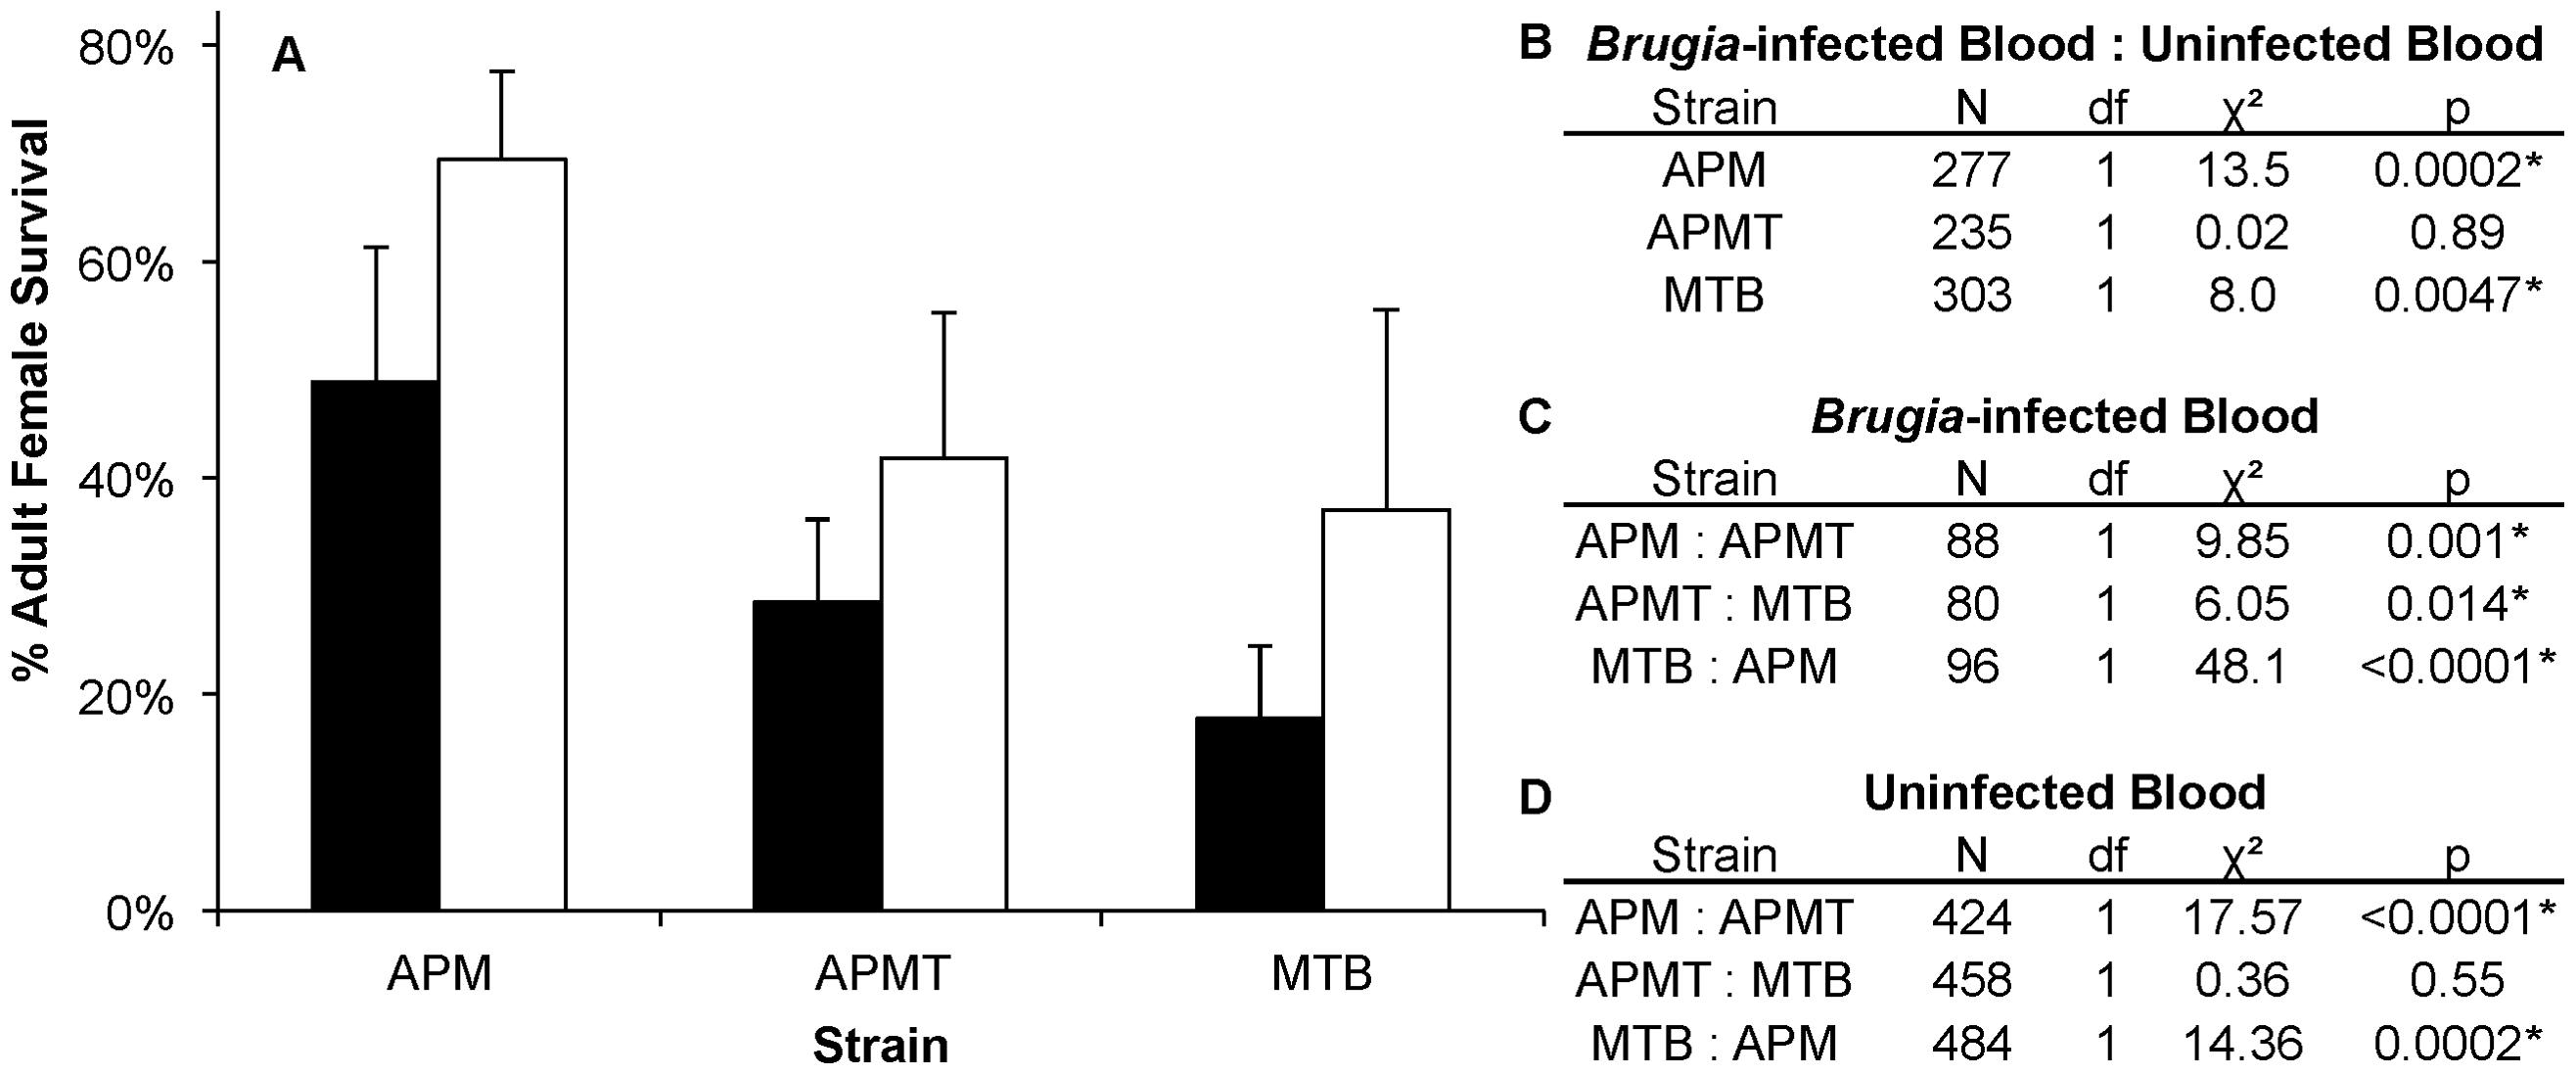 Survivorship of <i>Ae. polynesiensis</i> strains after feeding on <i>Brugia</i>-infected blood vs. uninfected blood.